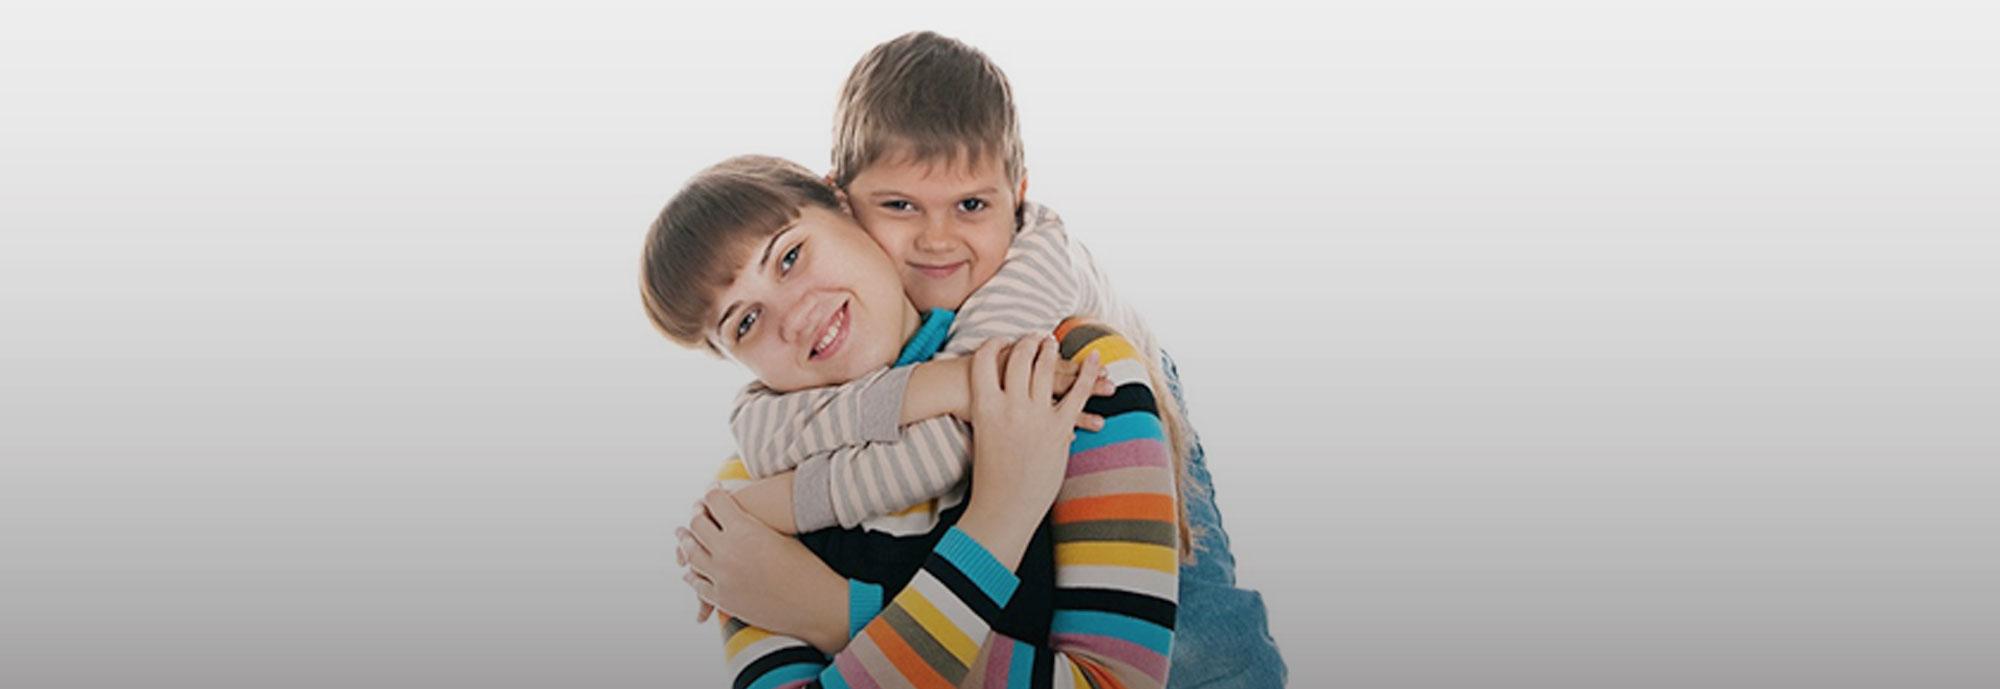 child hugging mom